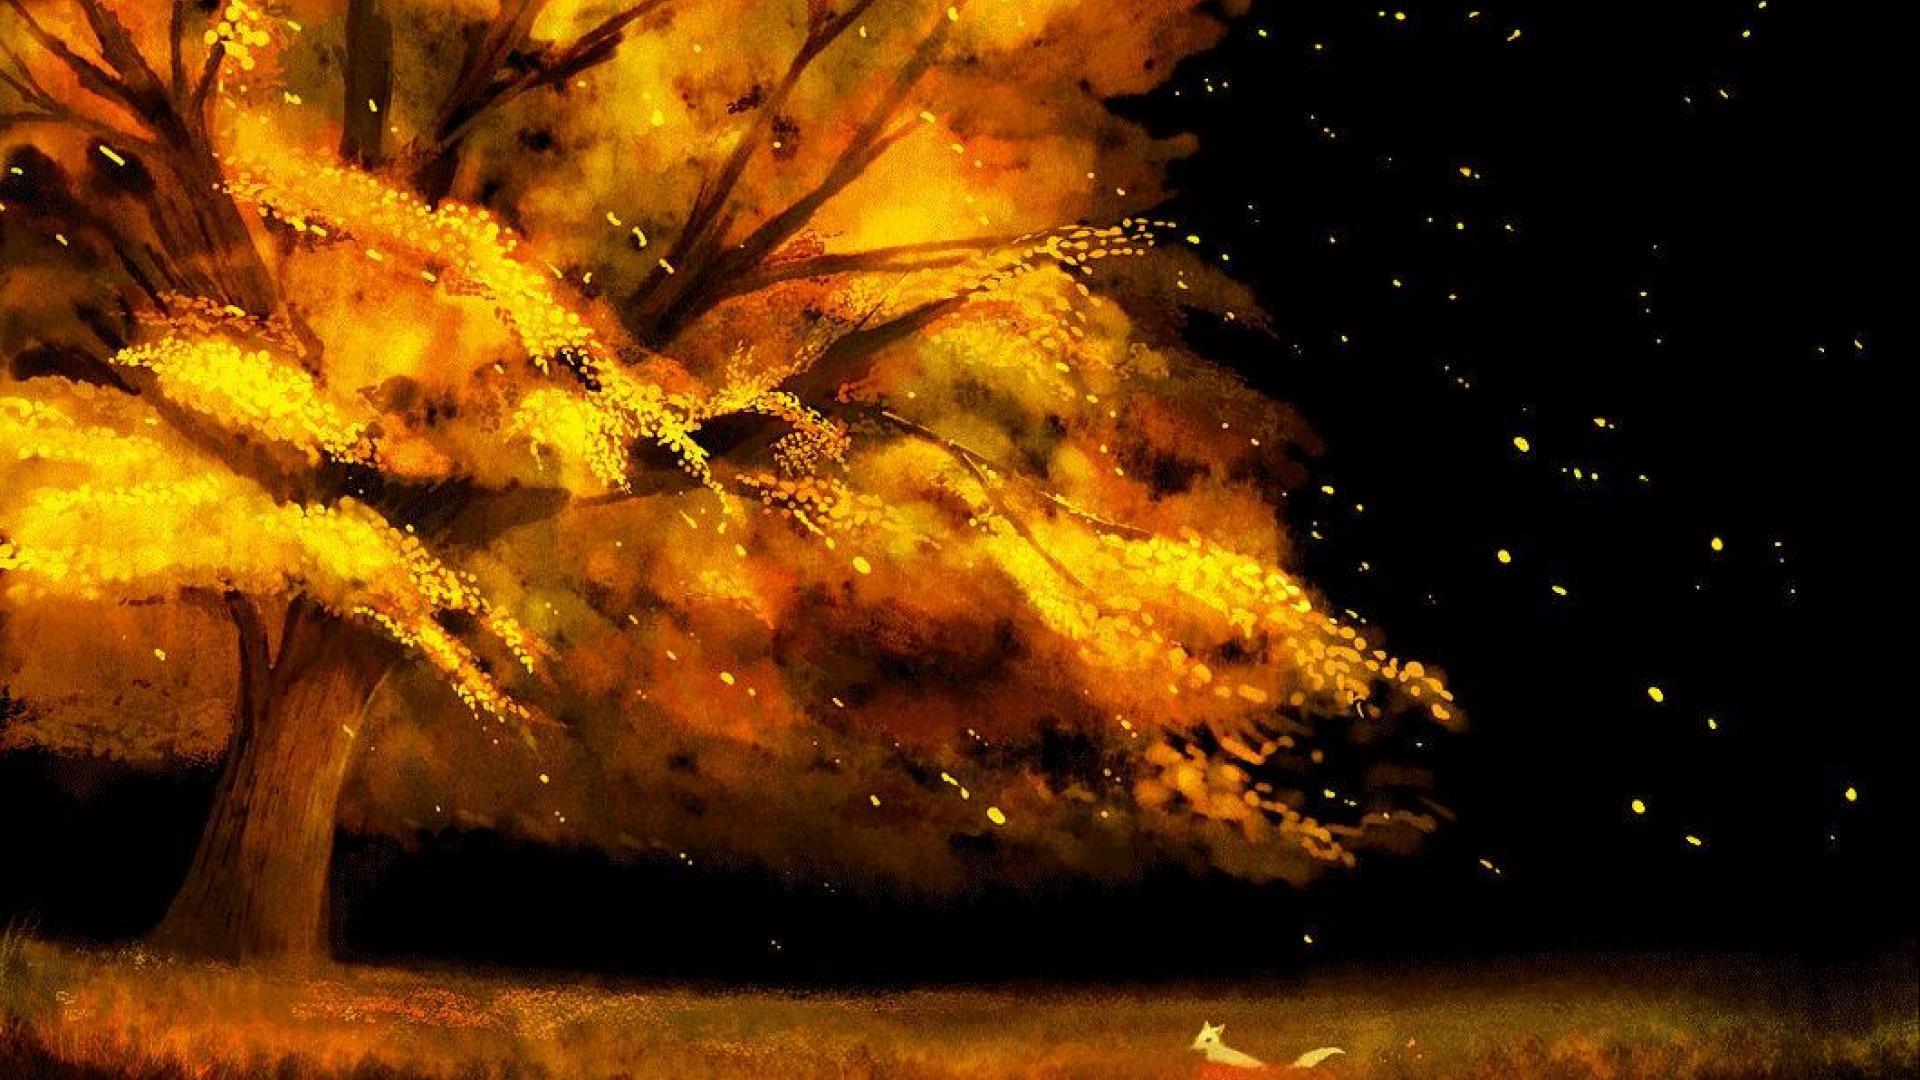 Fall Leaves Hd Desktop Wallpaper Anime Fall Wallpapers 59 Images